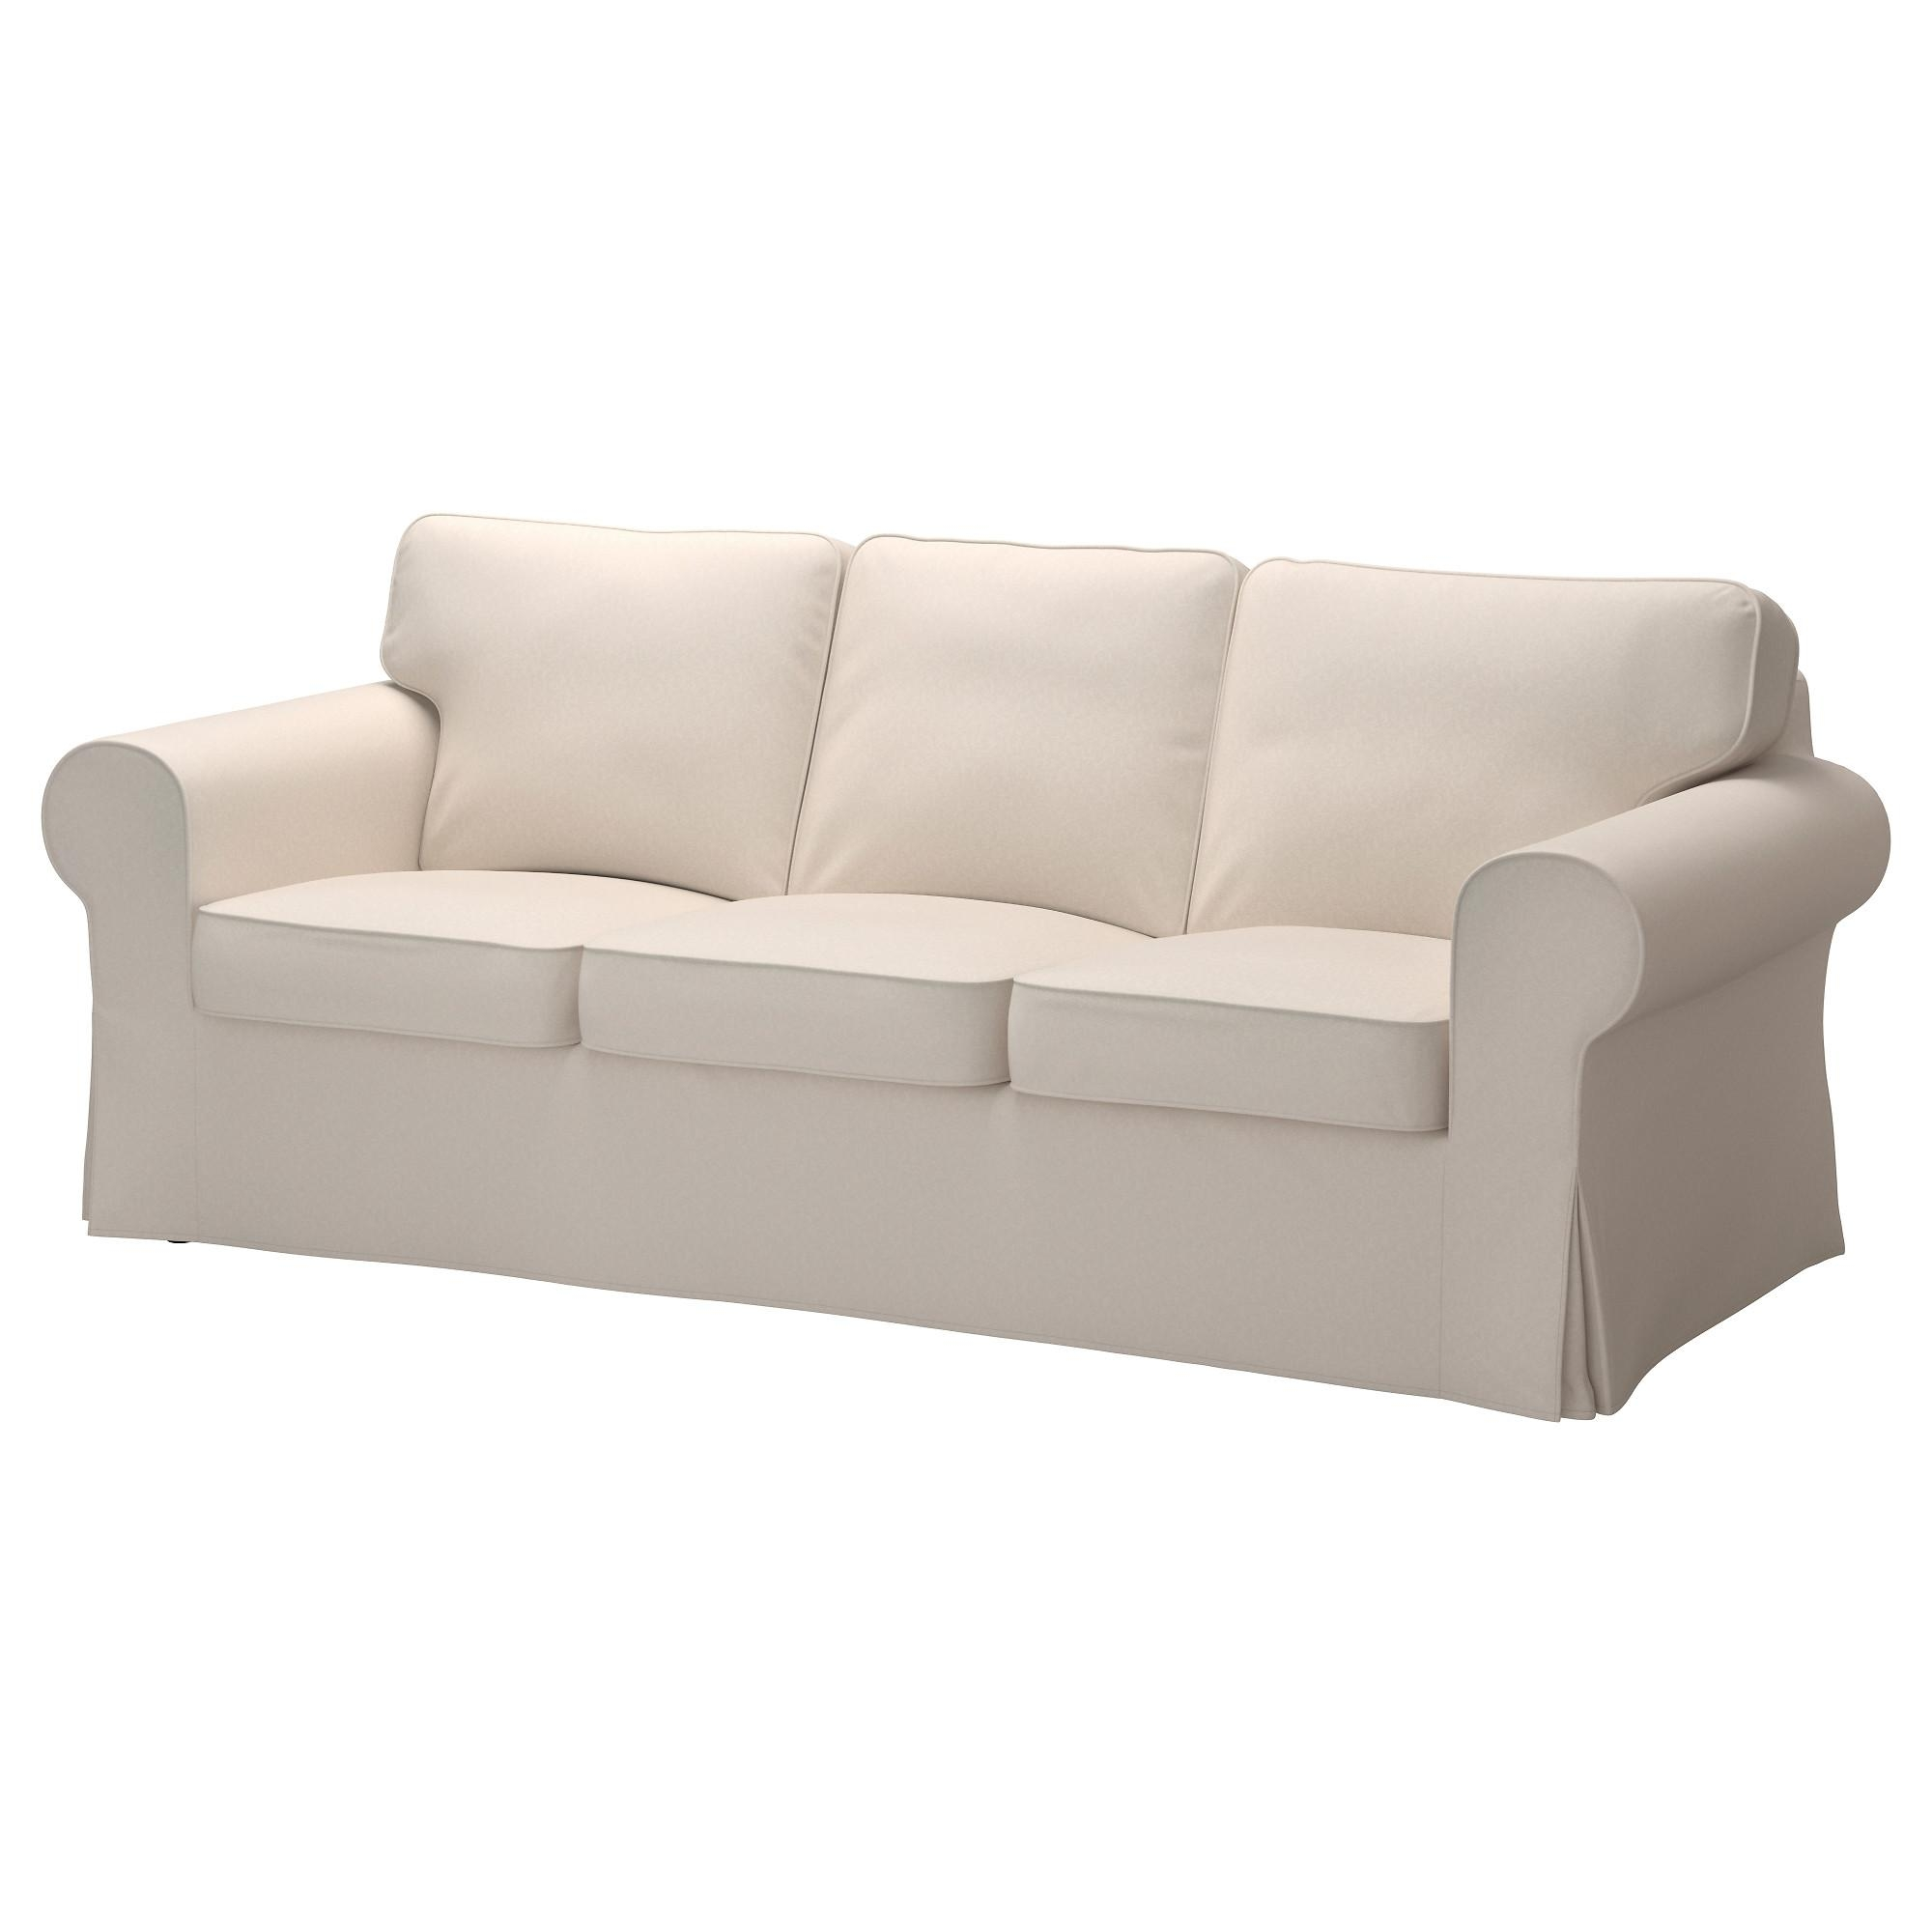 Ektorp Sofa – Lofallet Beige – Ikea Within Sofa Chairs Ikea (View 7 of 20)